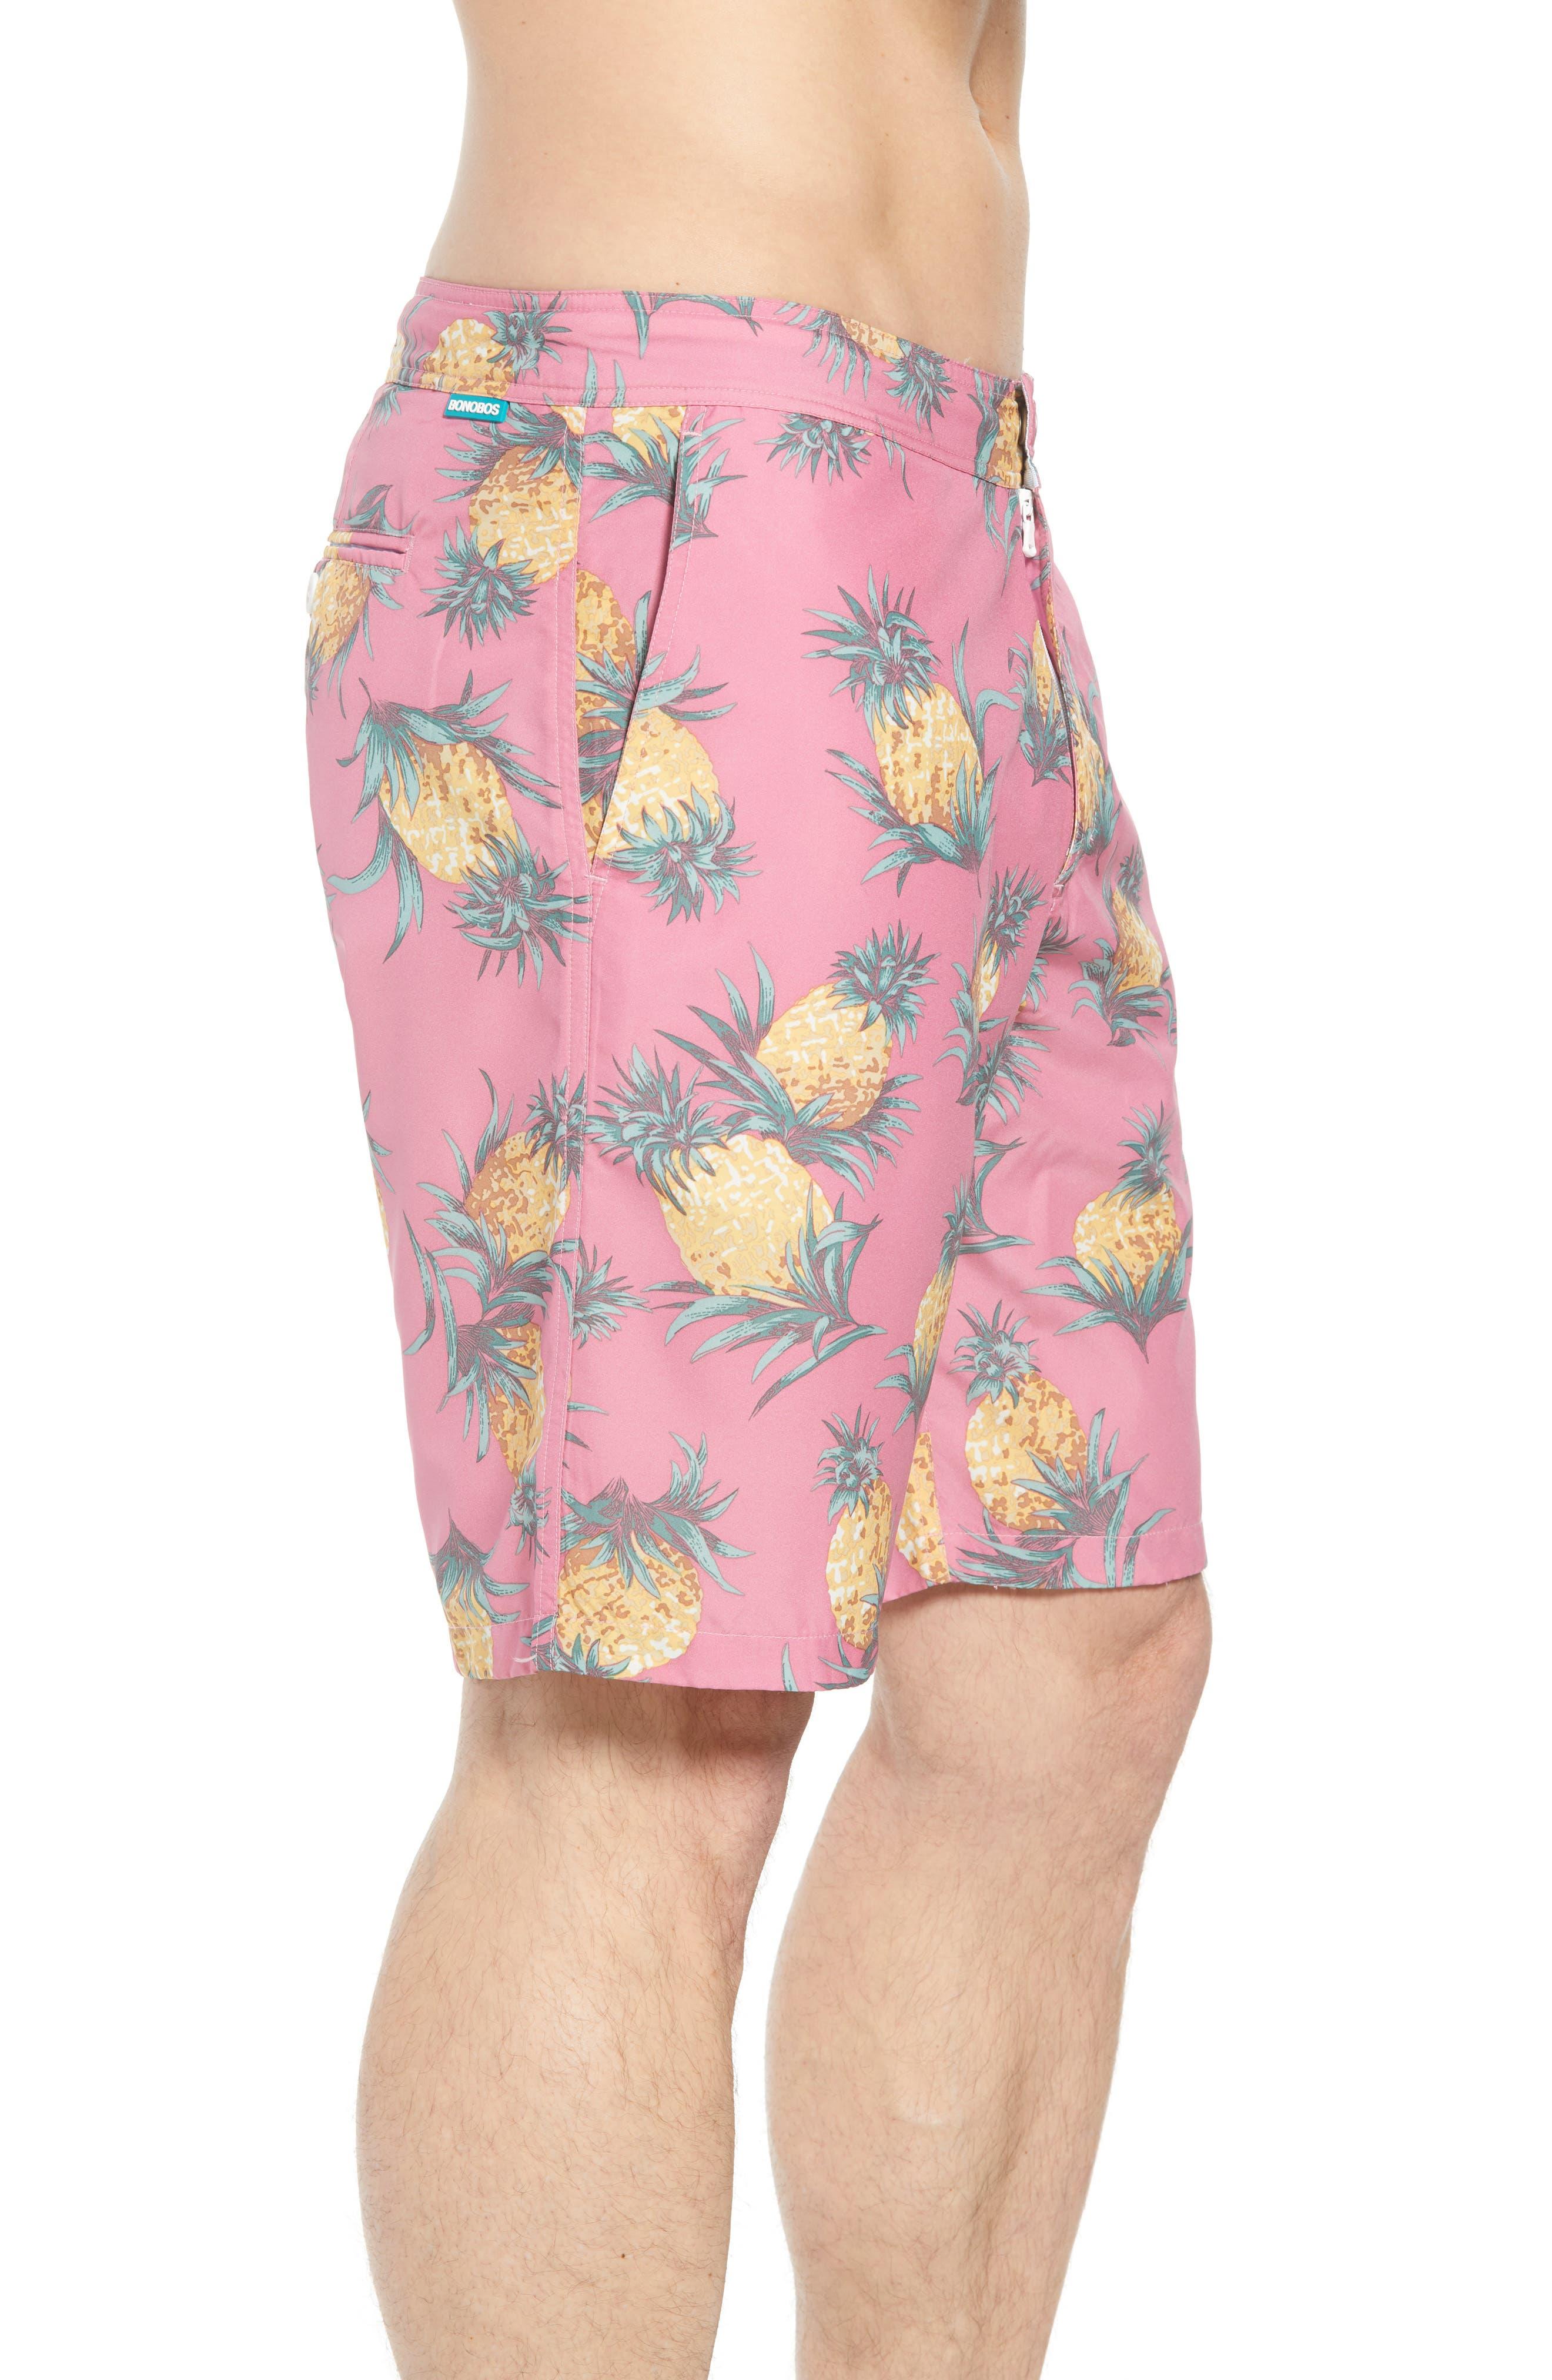 Banzai 9-Inch Swim Trunks,                             Alternate thumbnail 3, color,                             Pineapples Print